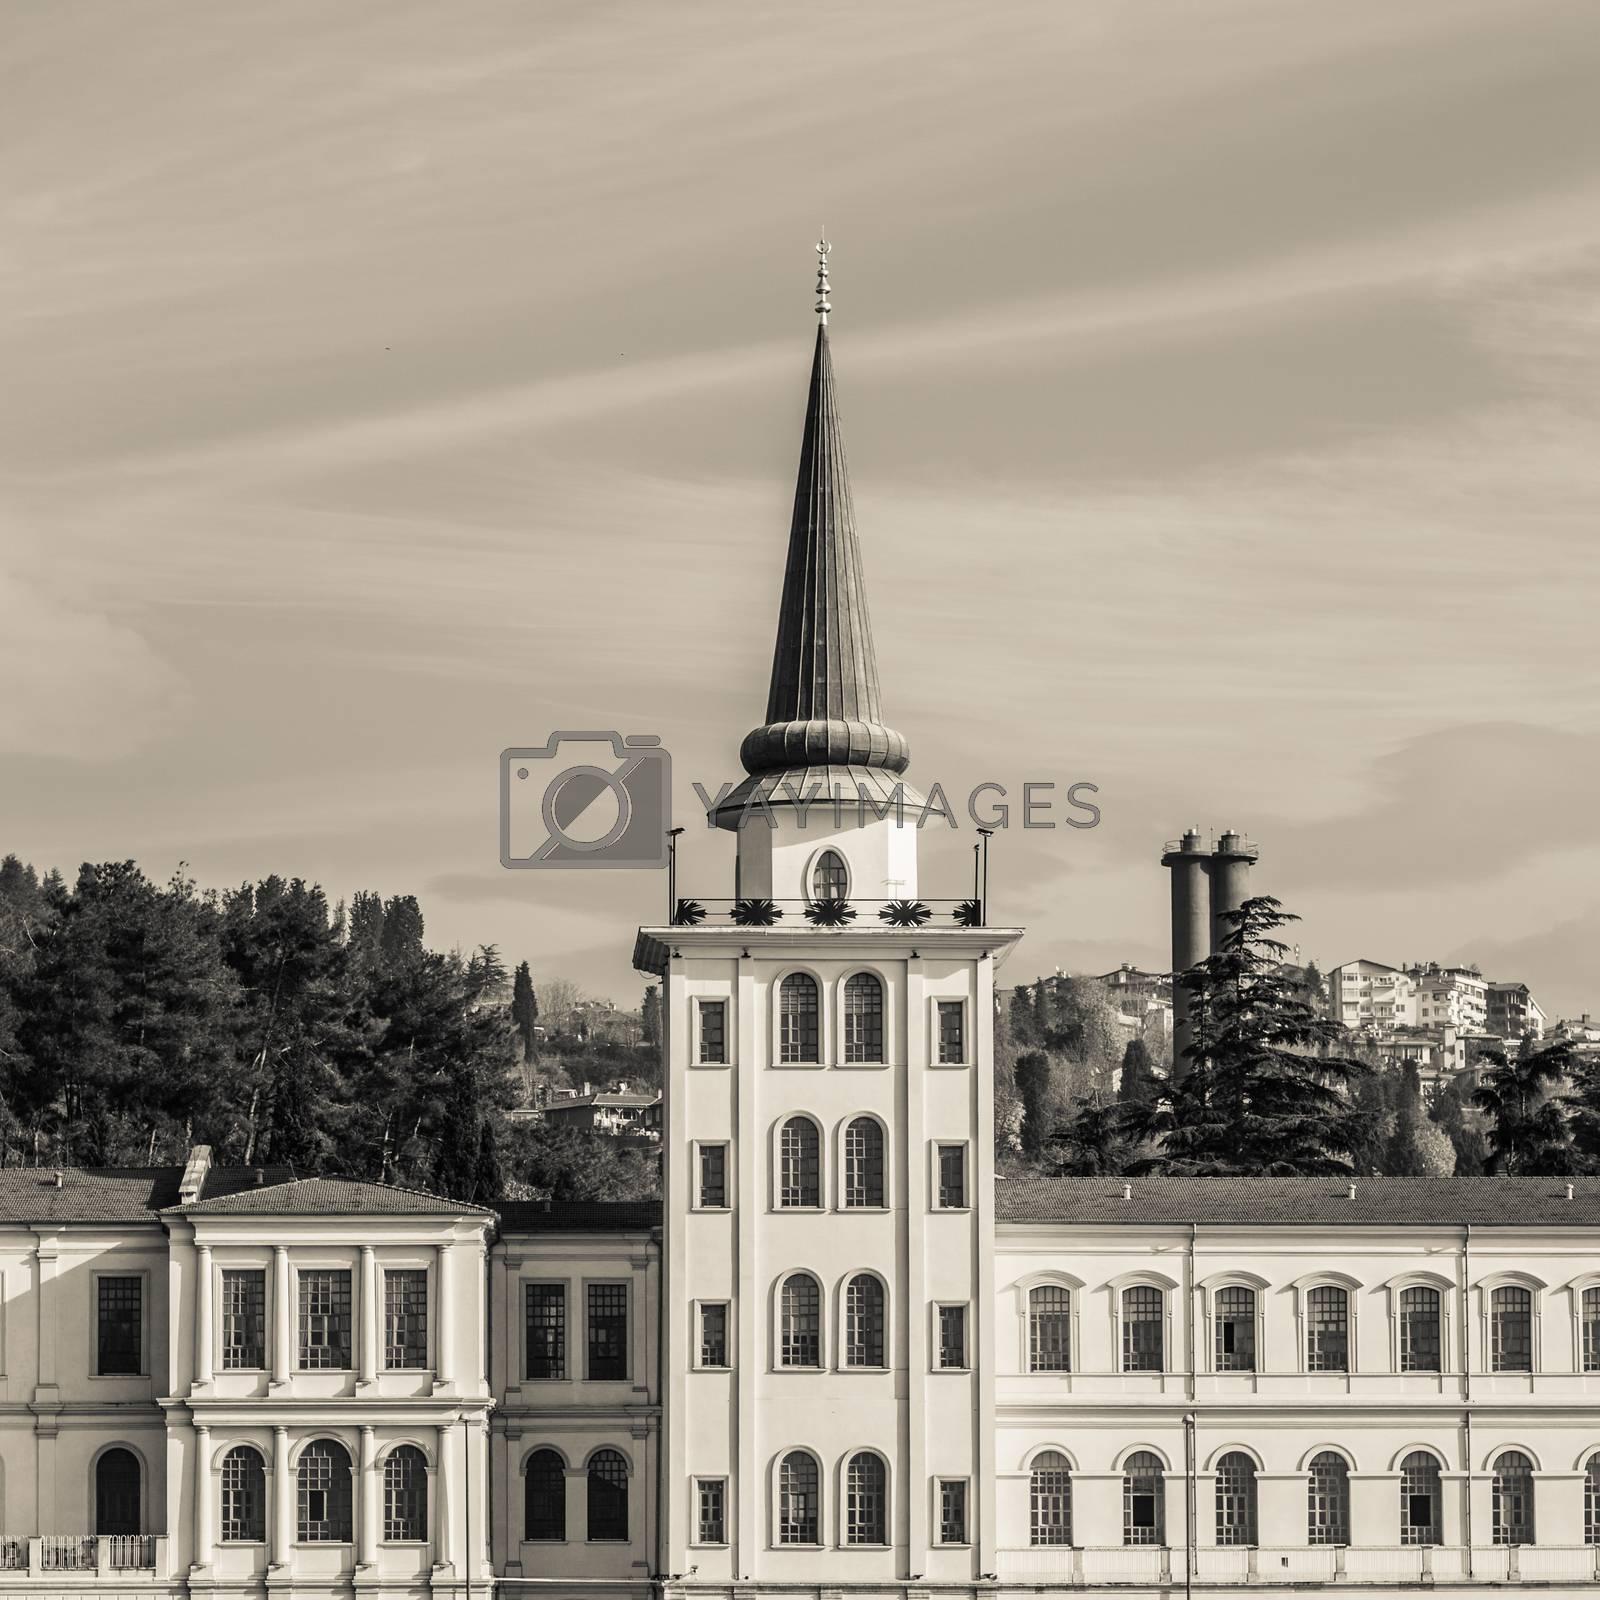 Kuleli military high school from Bosphorus, Istanbul, Turkey.